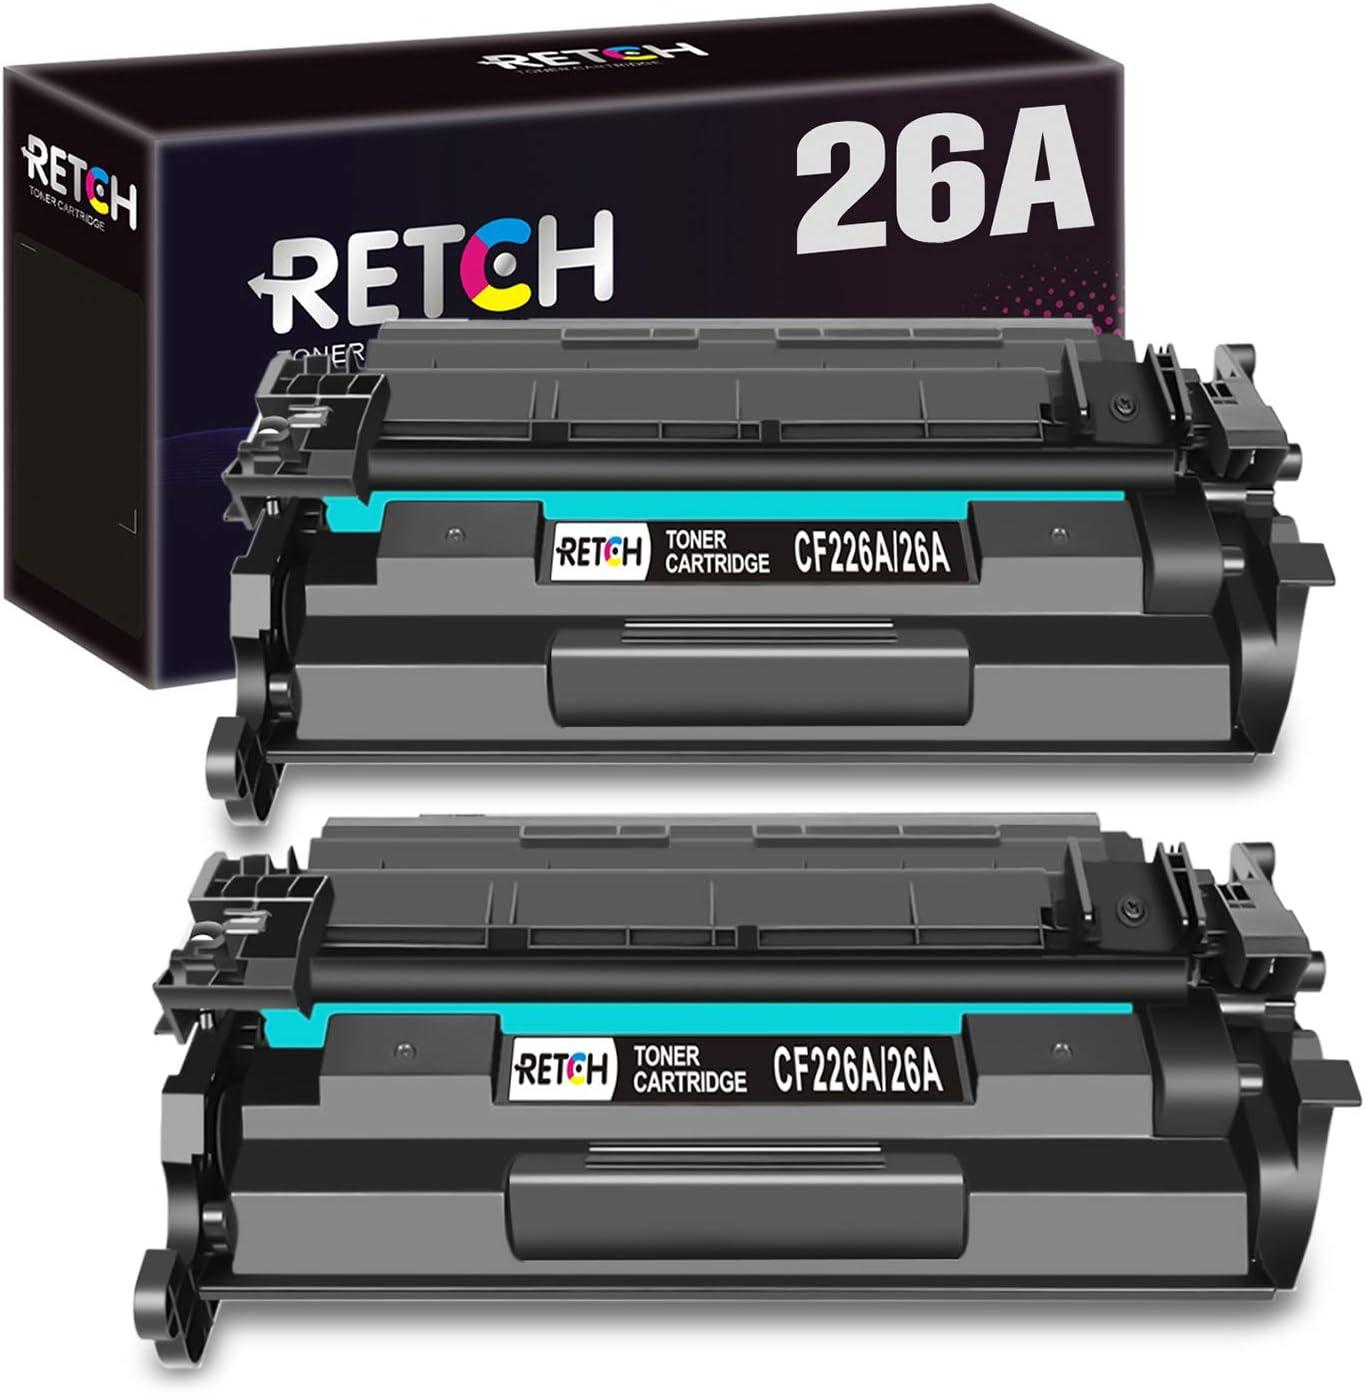 RETCH Compatible Black Toner Cartridges for HP 26A CF226A 26X CF226X, Work with Laserjet Pro M402dne M402dn M402n M402dw MFP M426fdw M426fdn Printers (2 Pack)